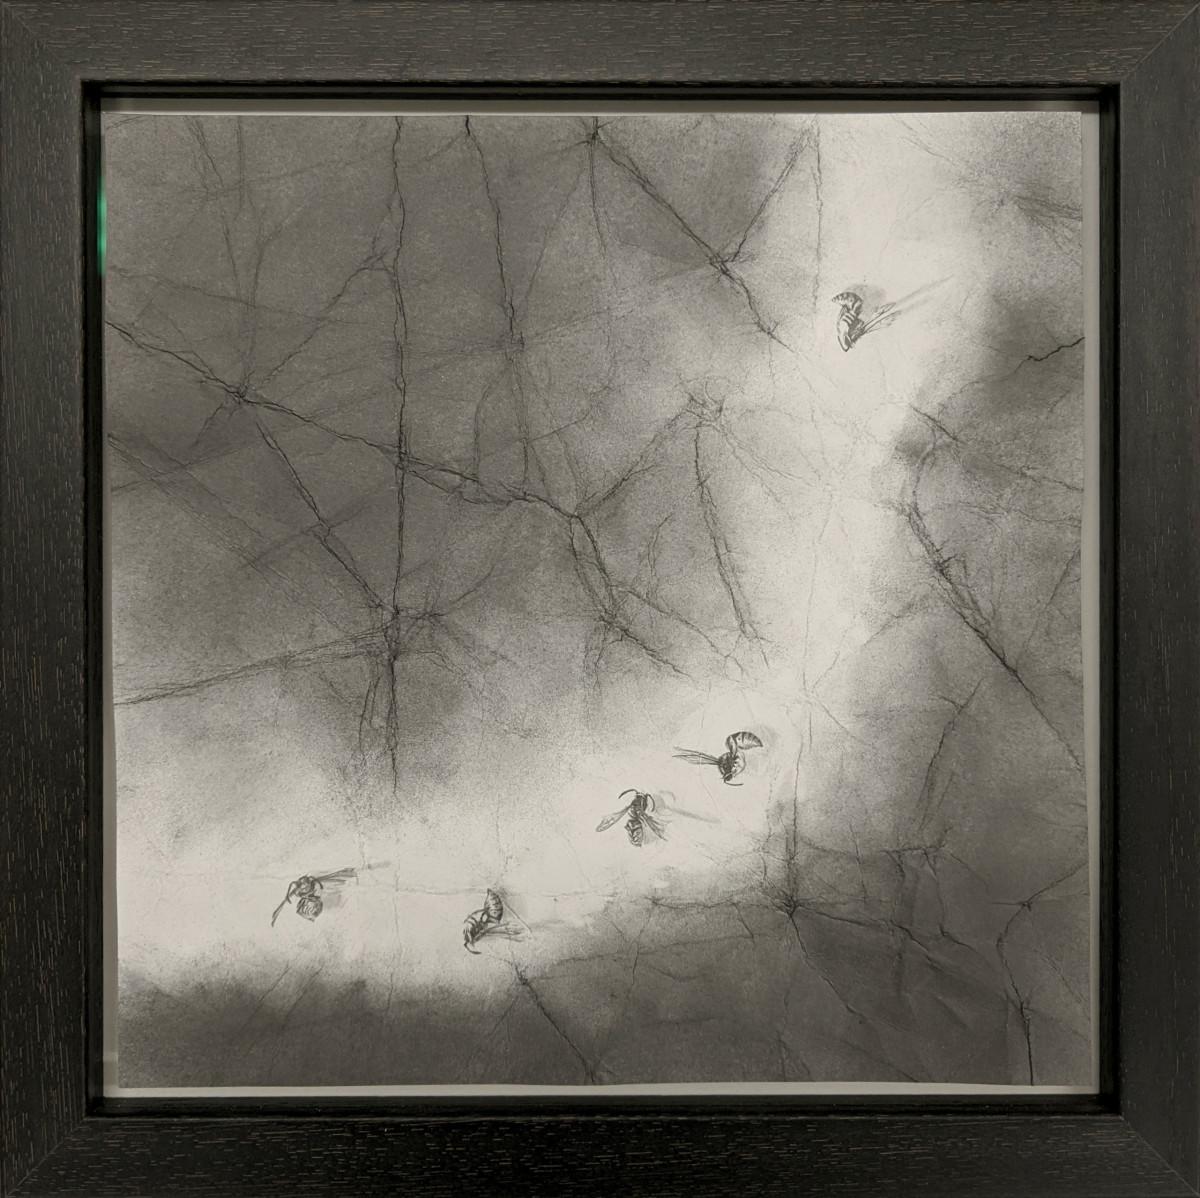 FlightPath xxxxx (l) by Louisa Crispin